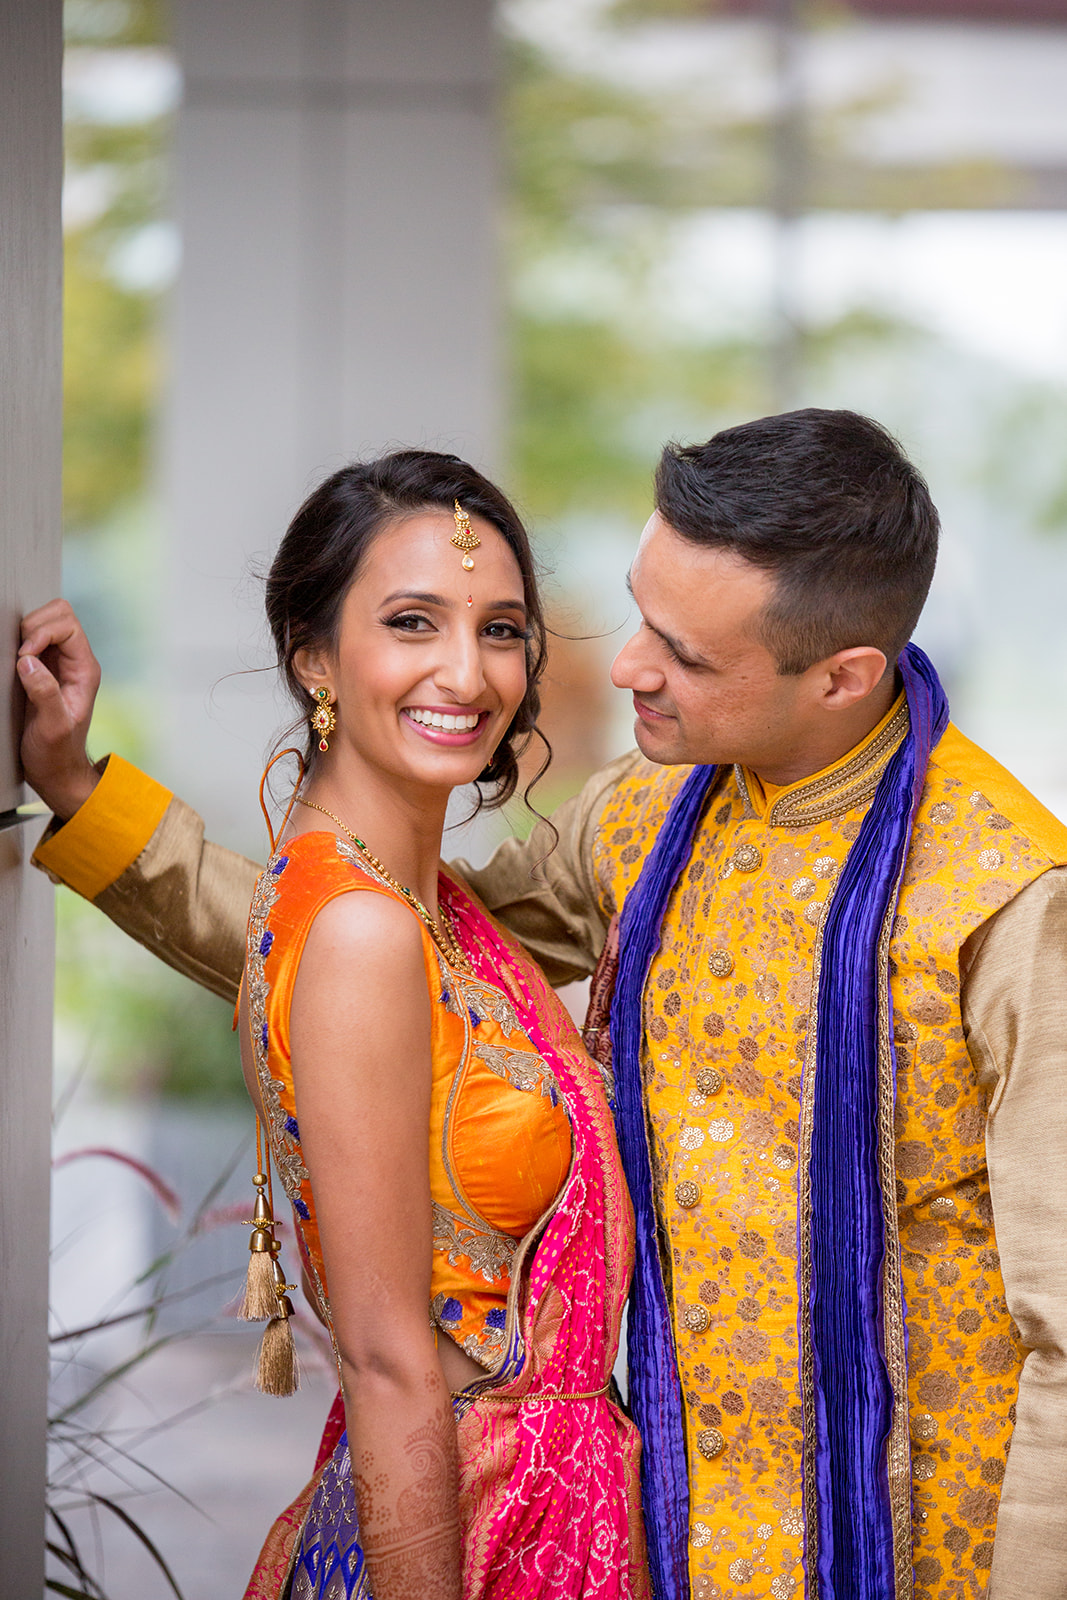 Le Cape Weddings - Monica and Pratik - Sangeet 00338.jpg